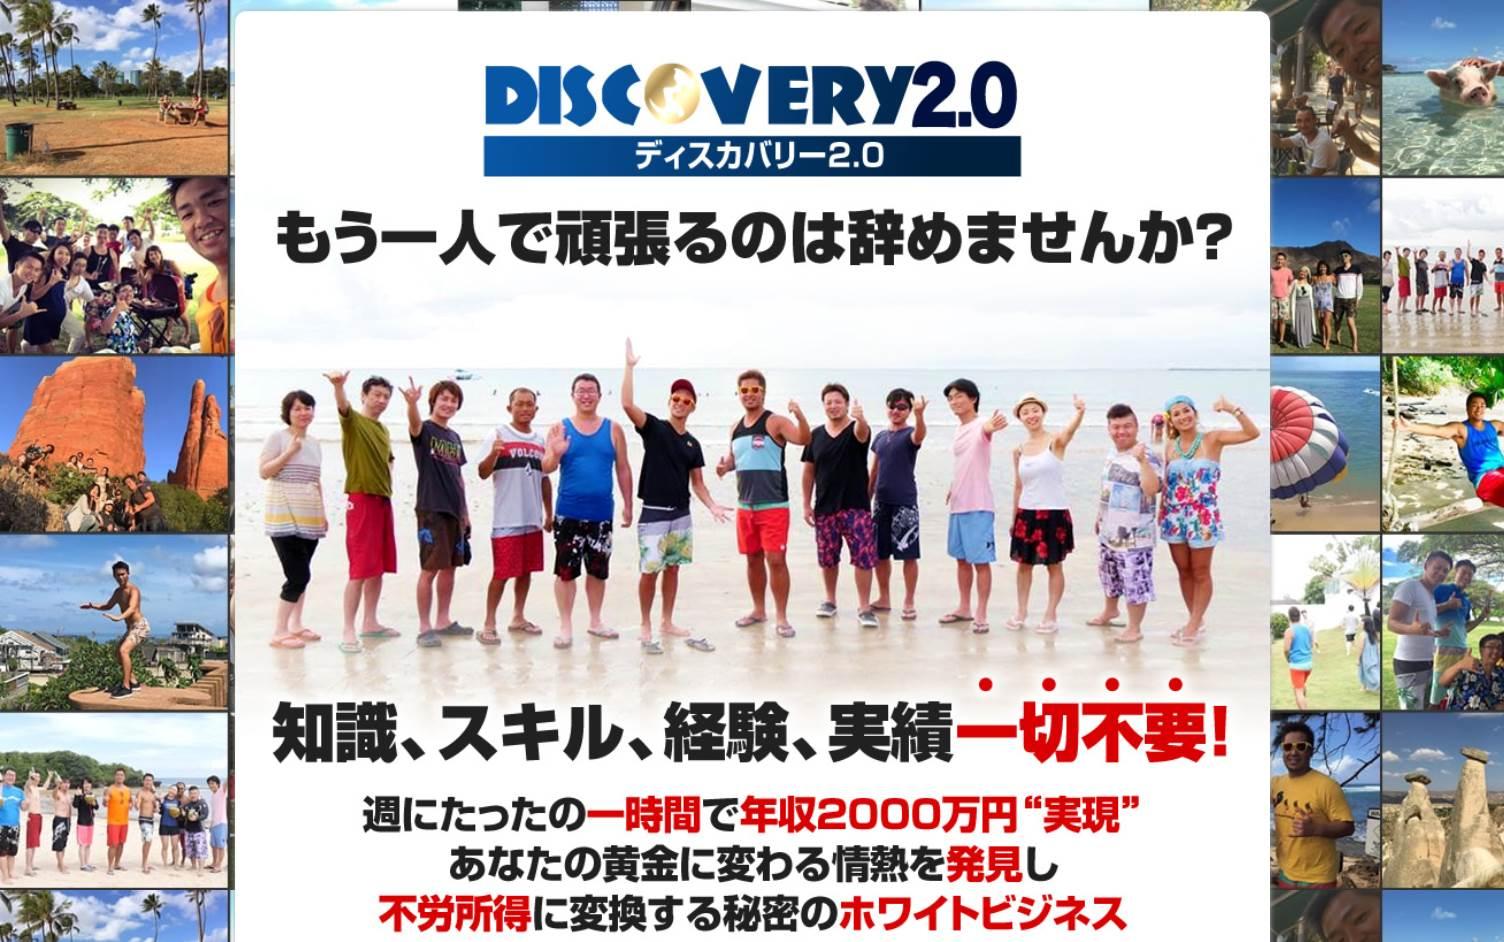 201709161153193c2.jpg